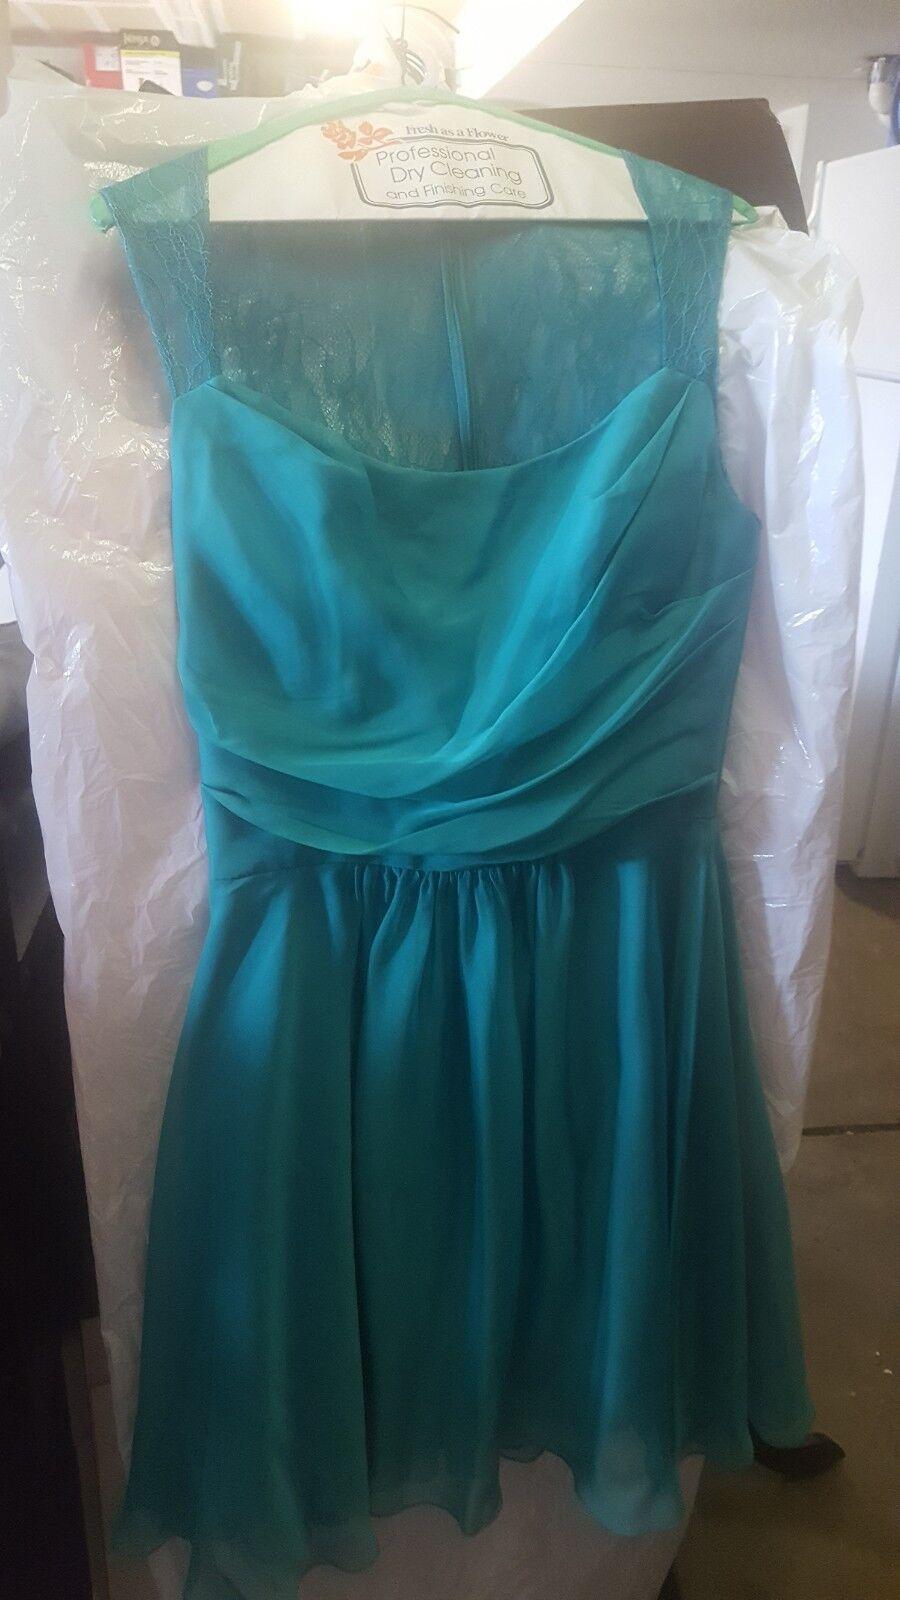 Homecoming dress size 12 Seafoam green